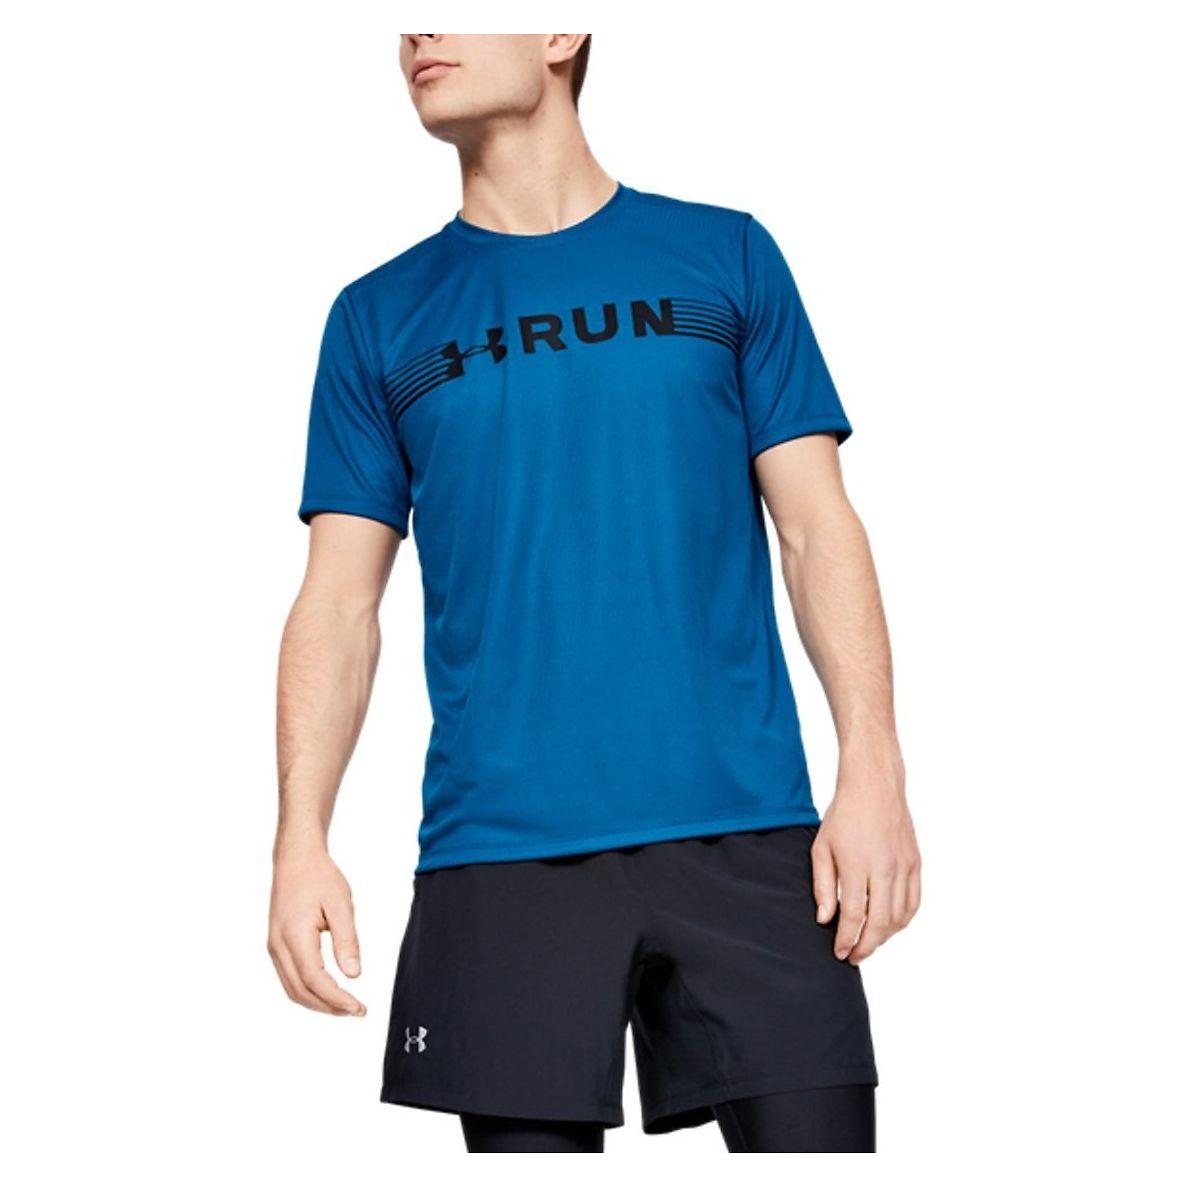 Koszulka męska do biegania Under Armour UA Run Warped 1342960